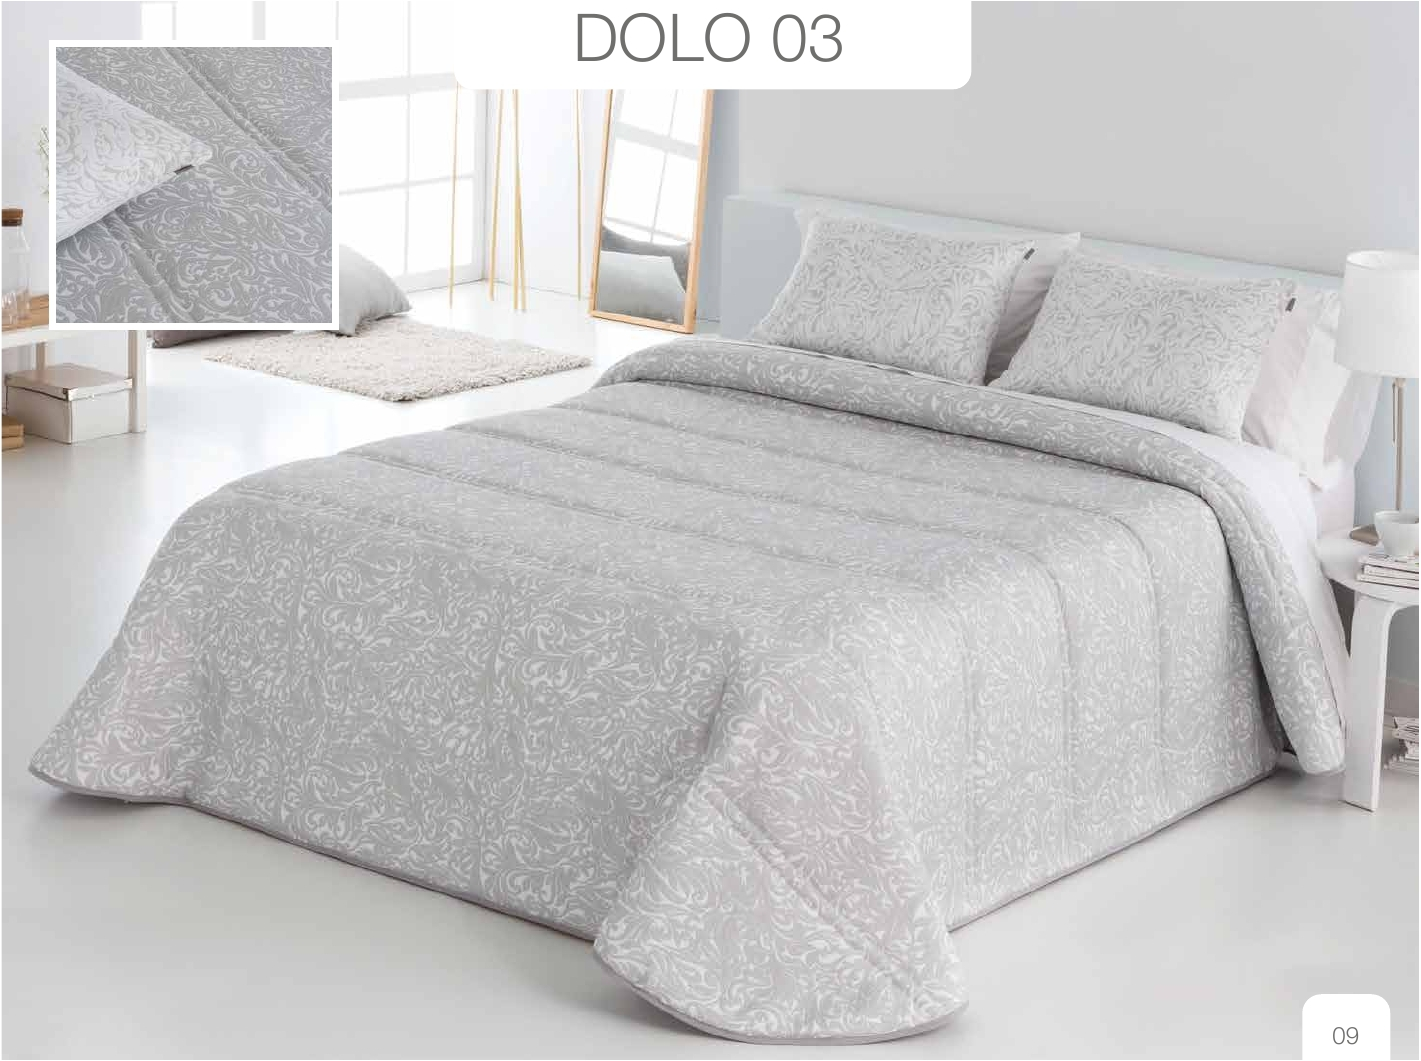 Conforter Bouti Jacquard Dolo Gris